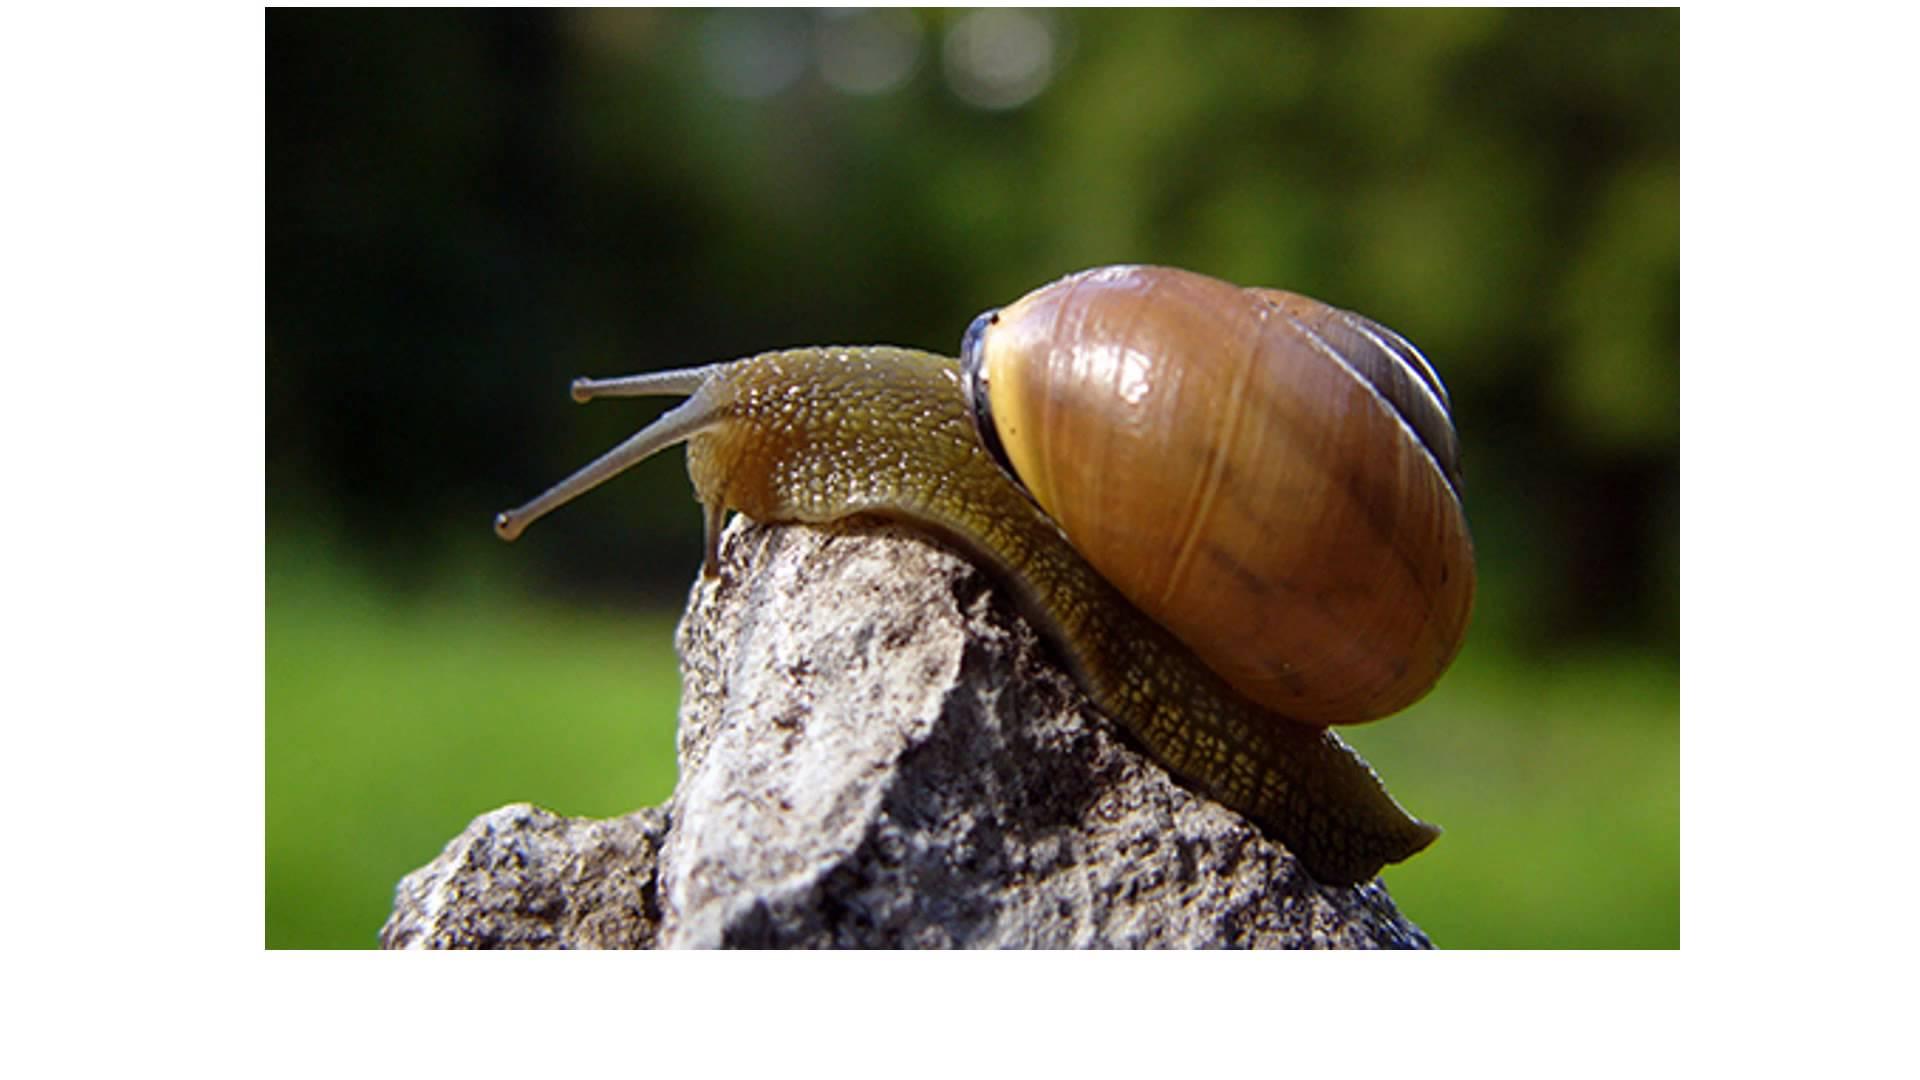 Molluska